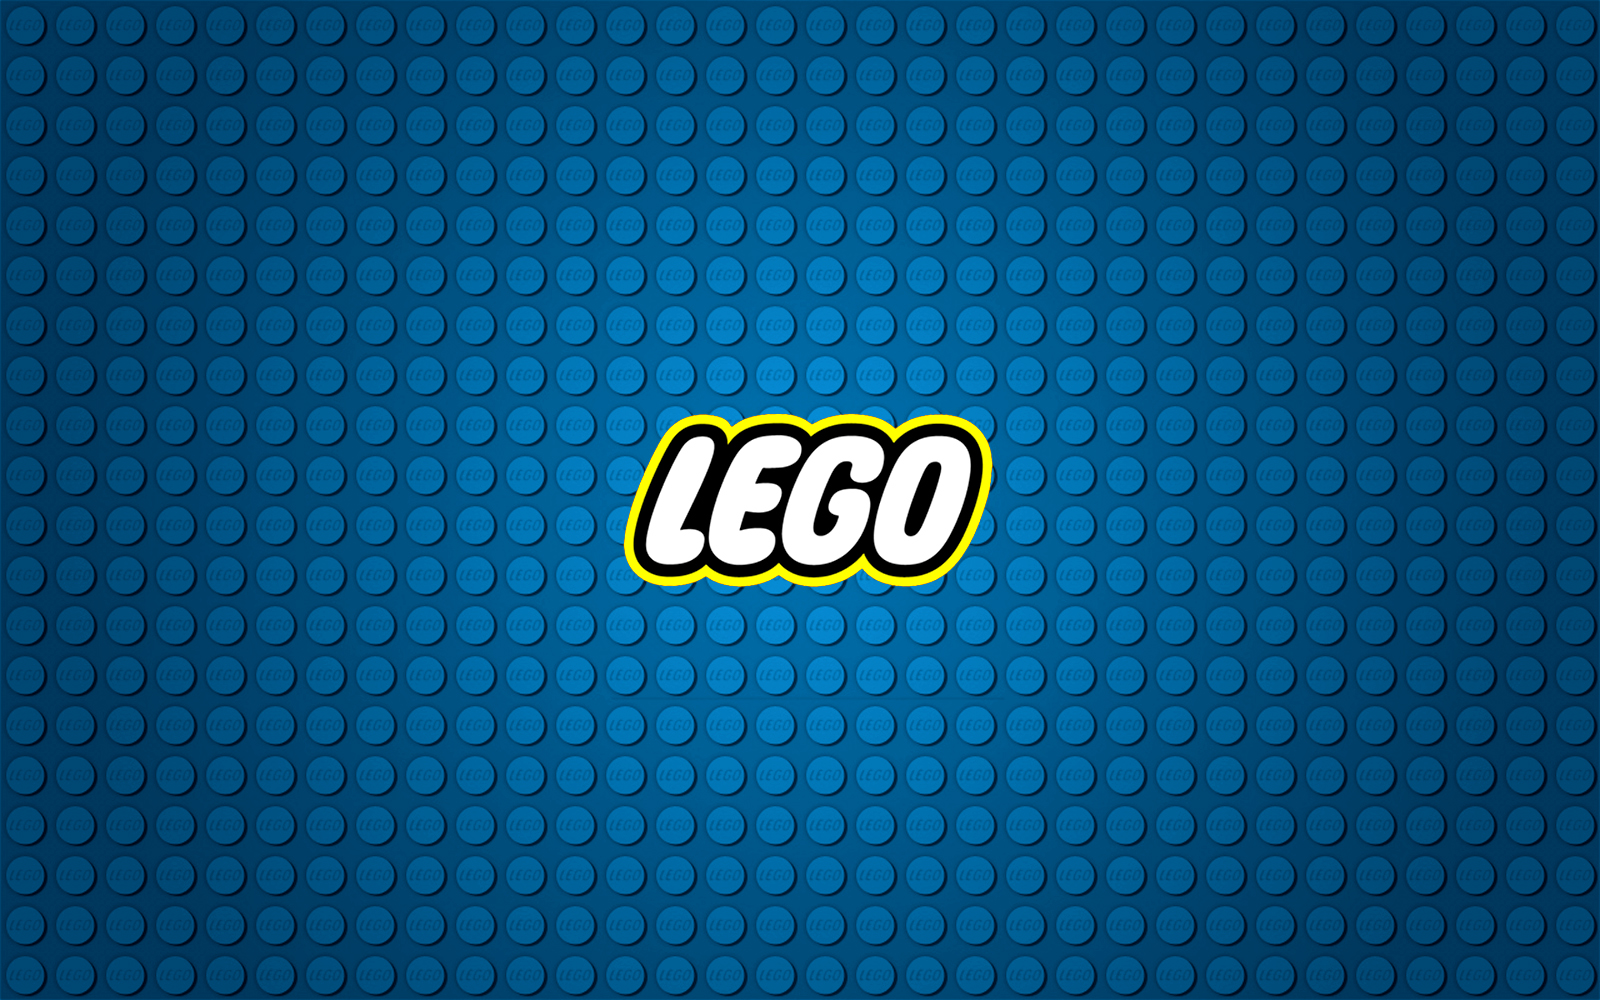 50 Lego Hd Wallpaper On Wallpapersafari